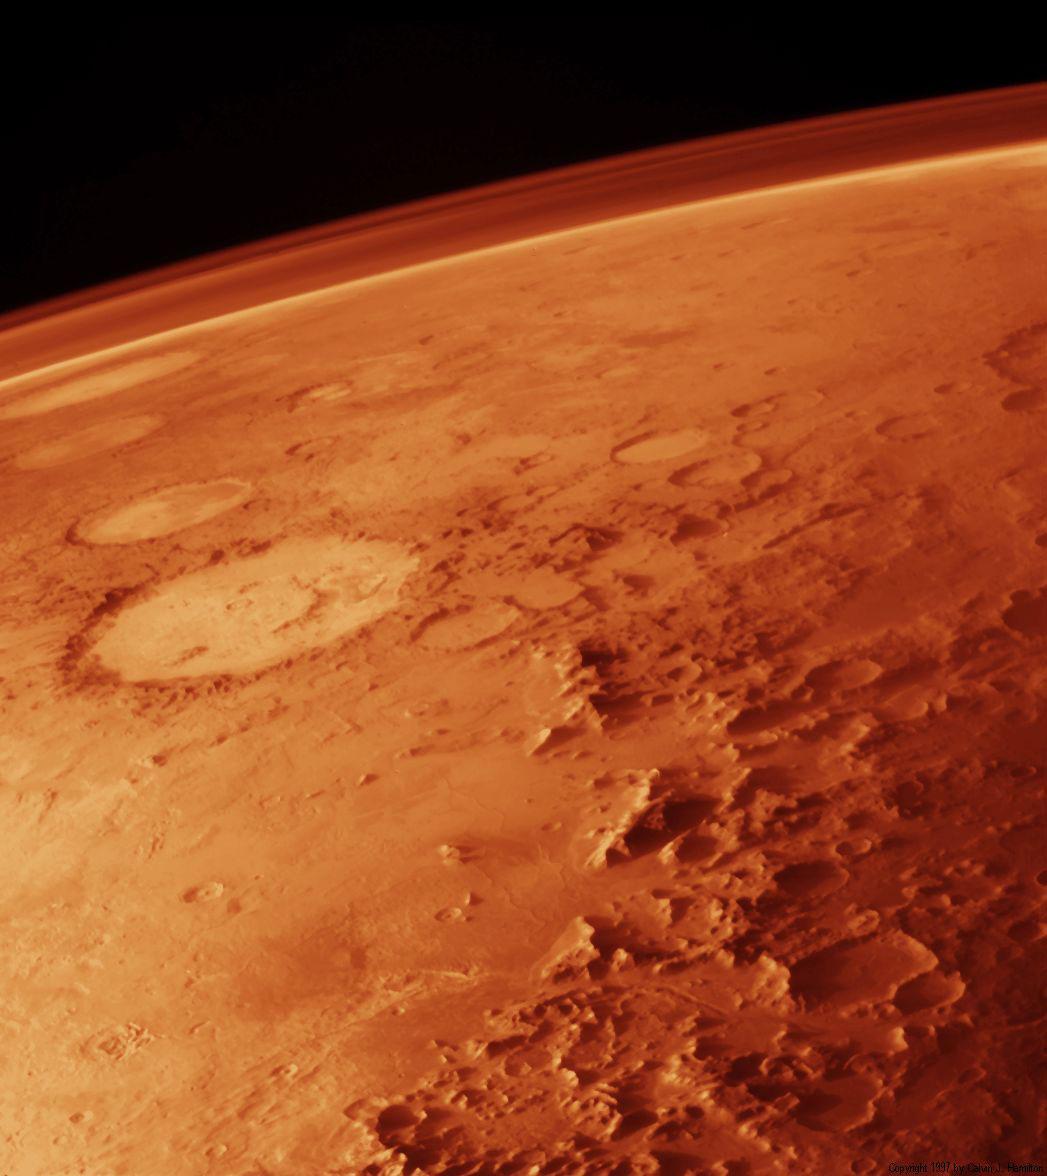 Atmosphère-Mars